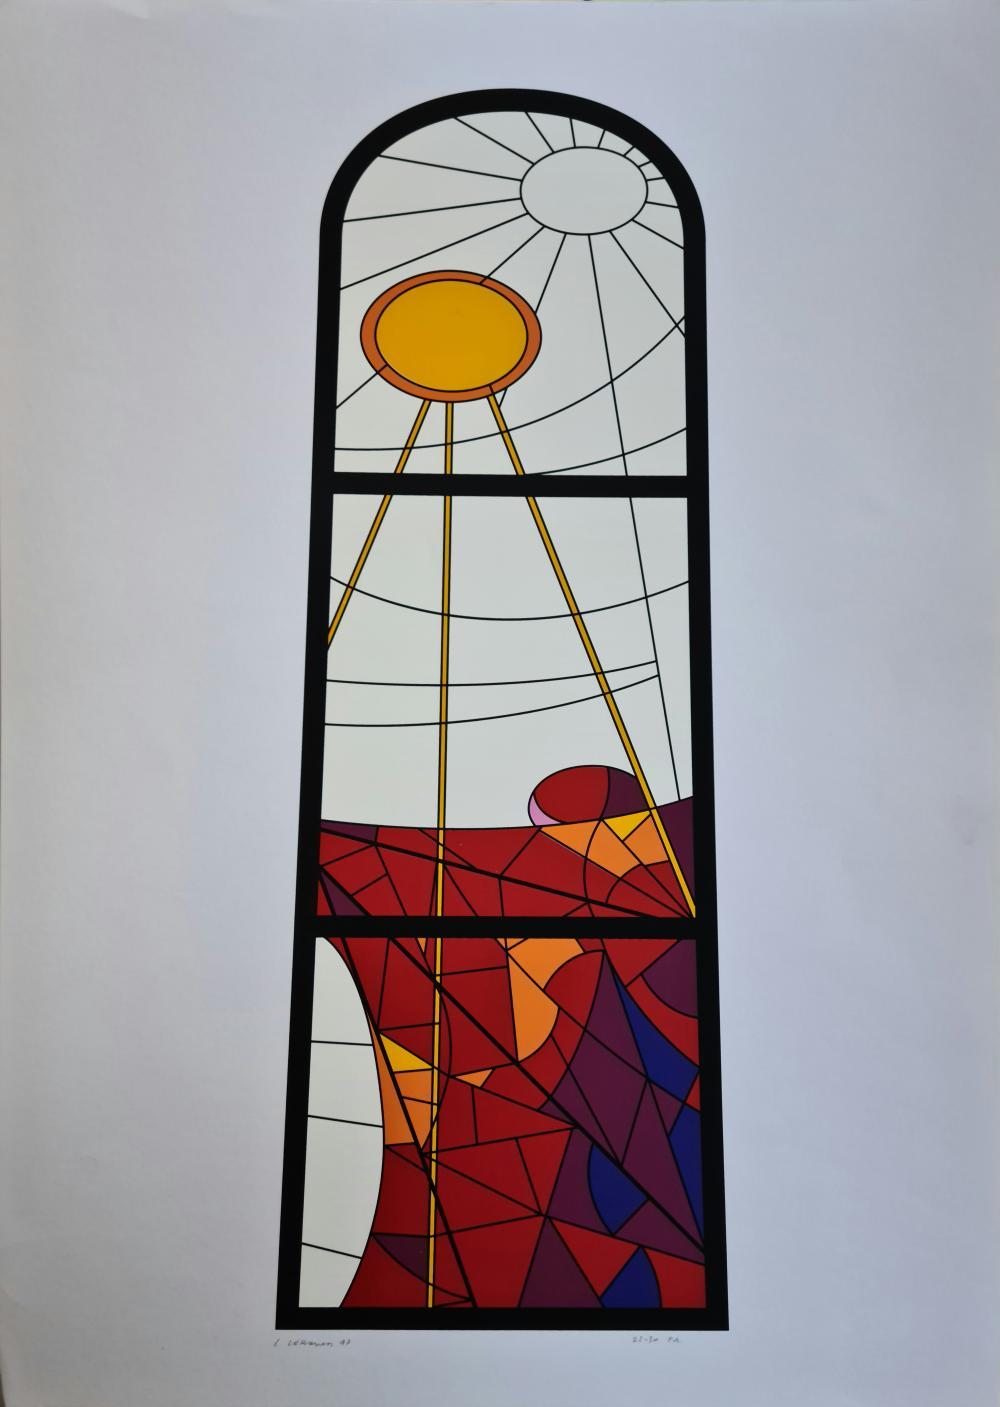 Veronesi Luigi - Costruzioni 2, 1997